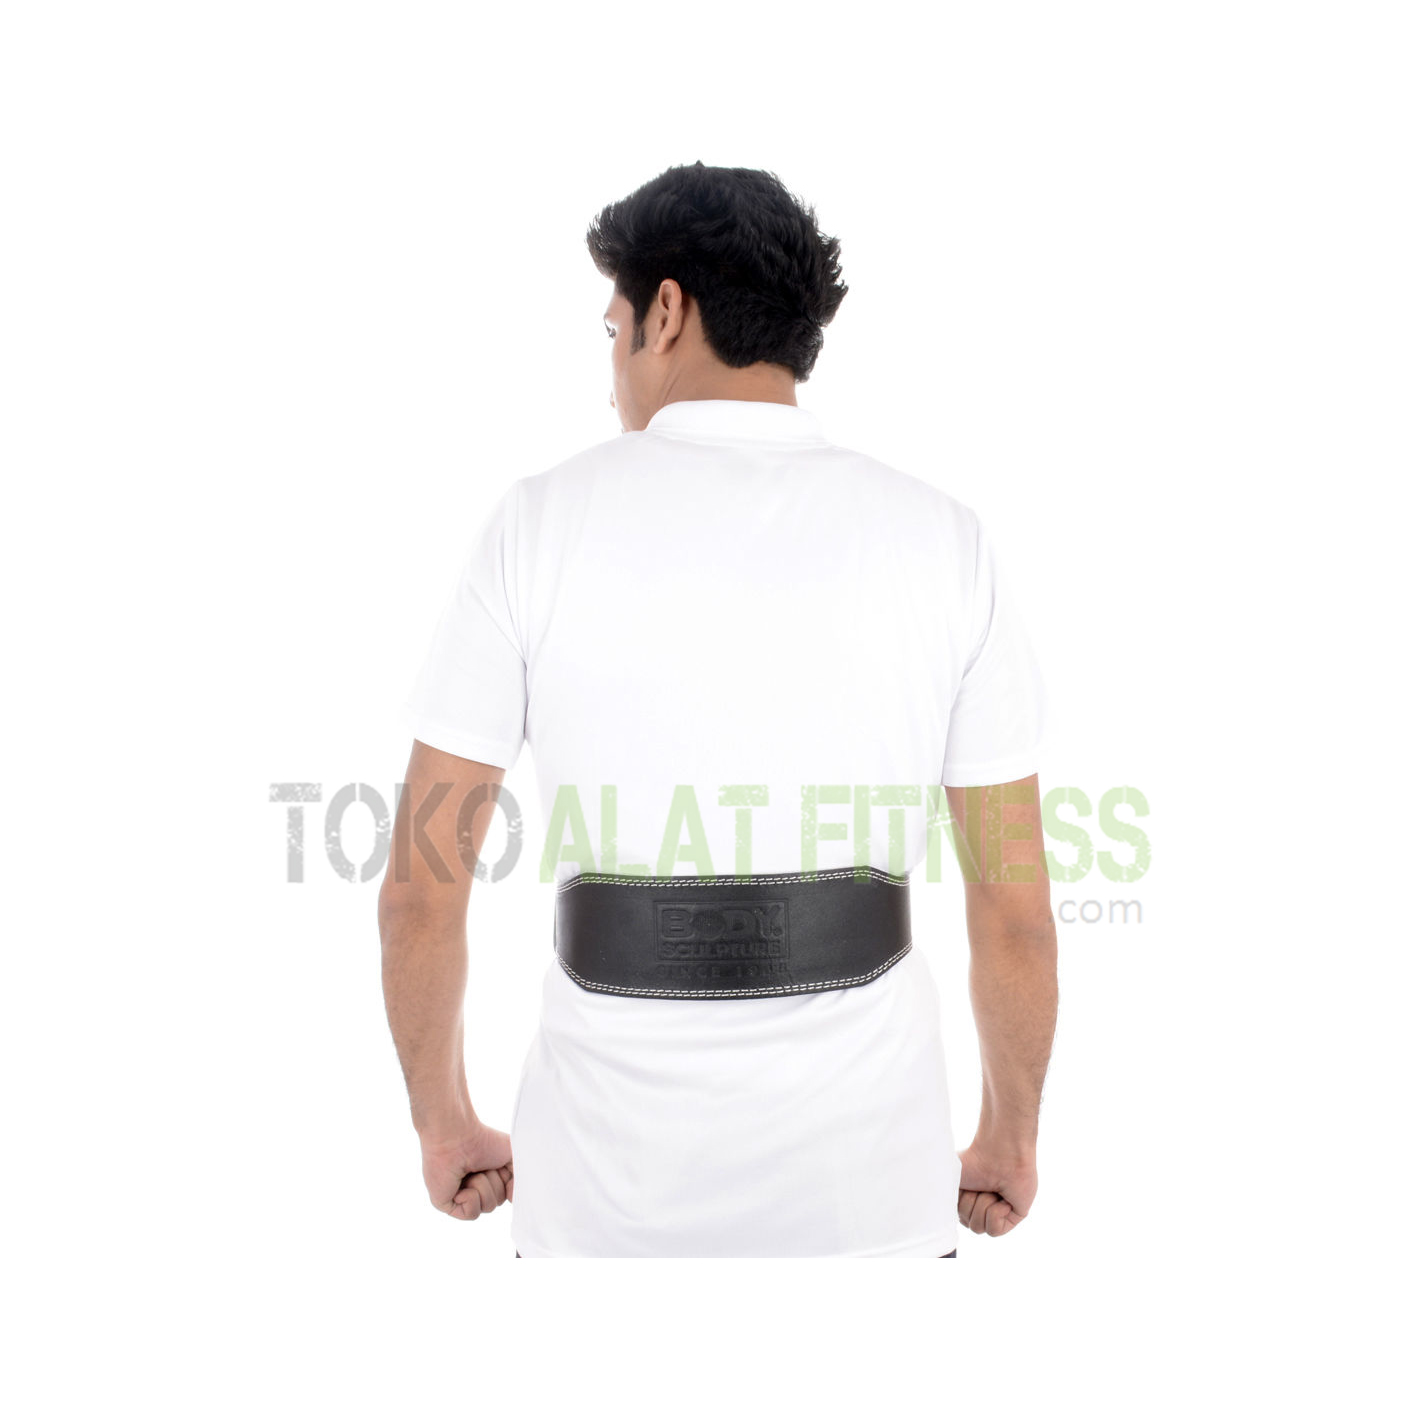 sabuk kulit bs2 - Sabuk Fitness Kulit (Weight Lifting Belt) L Hitam Body Sculpture - ASSSF1B